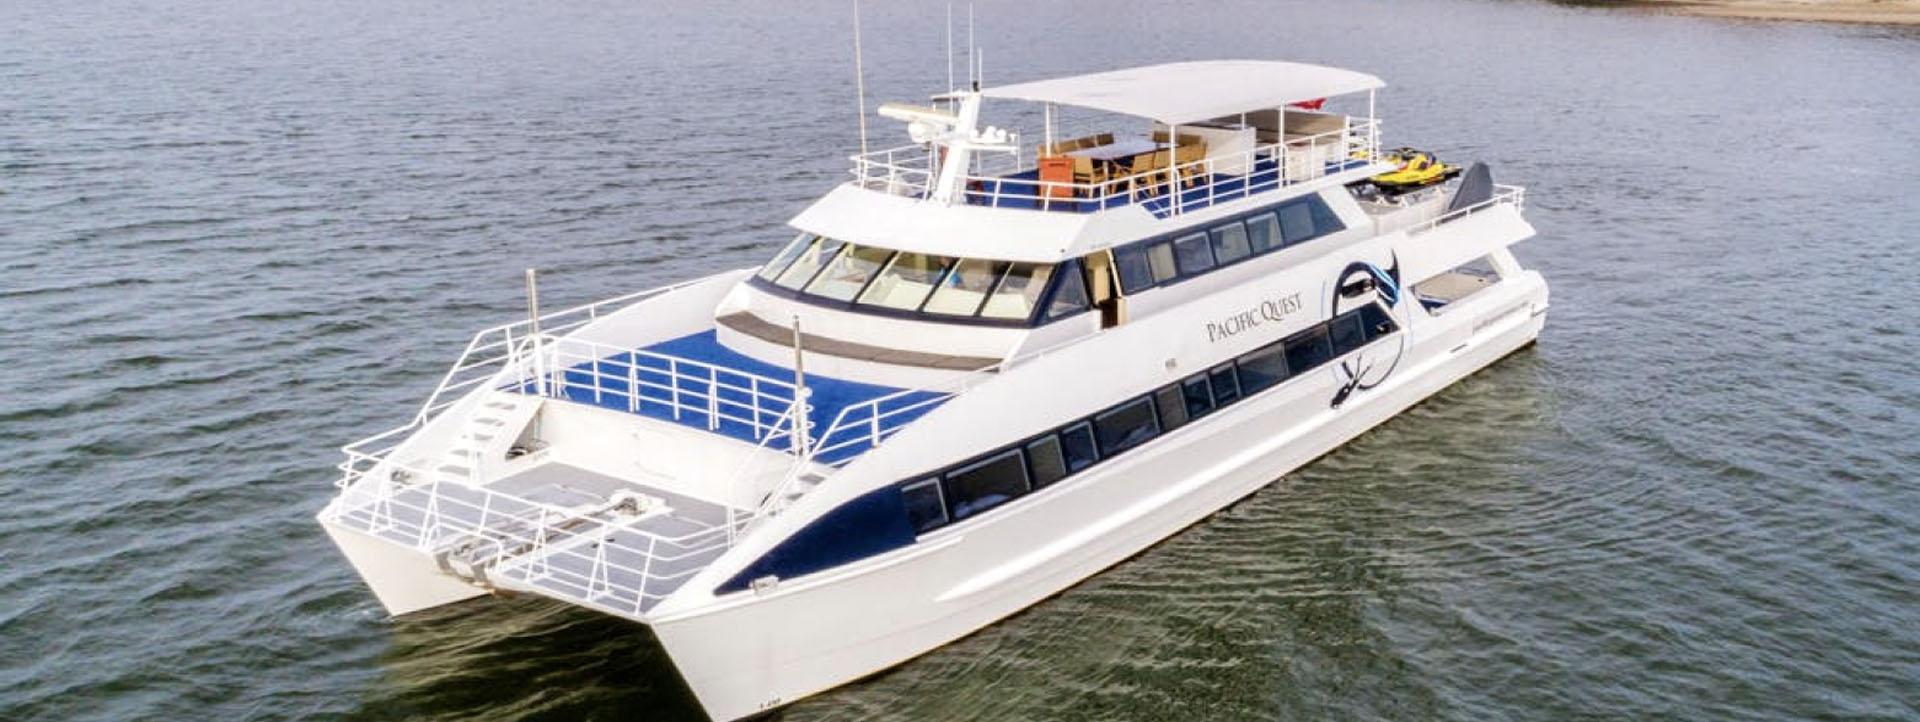 DIVERSITY III PACIFIC QUEST kimberley cruise boat 2022